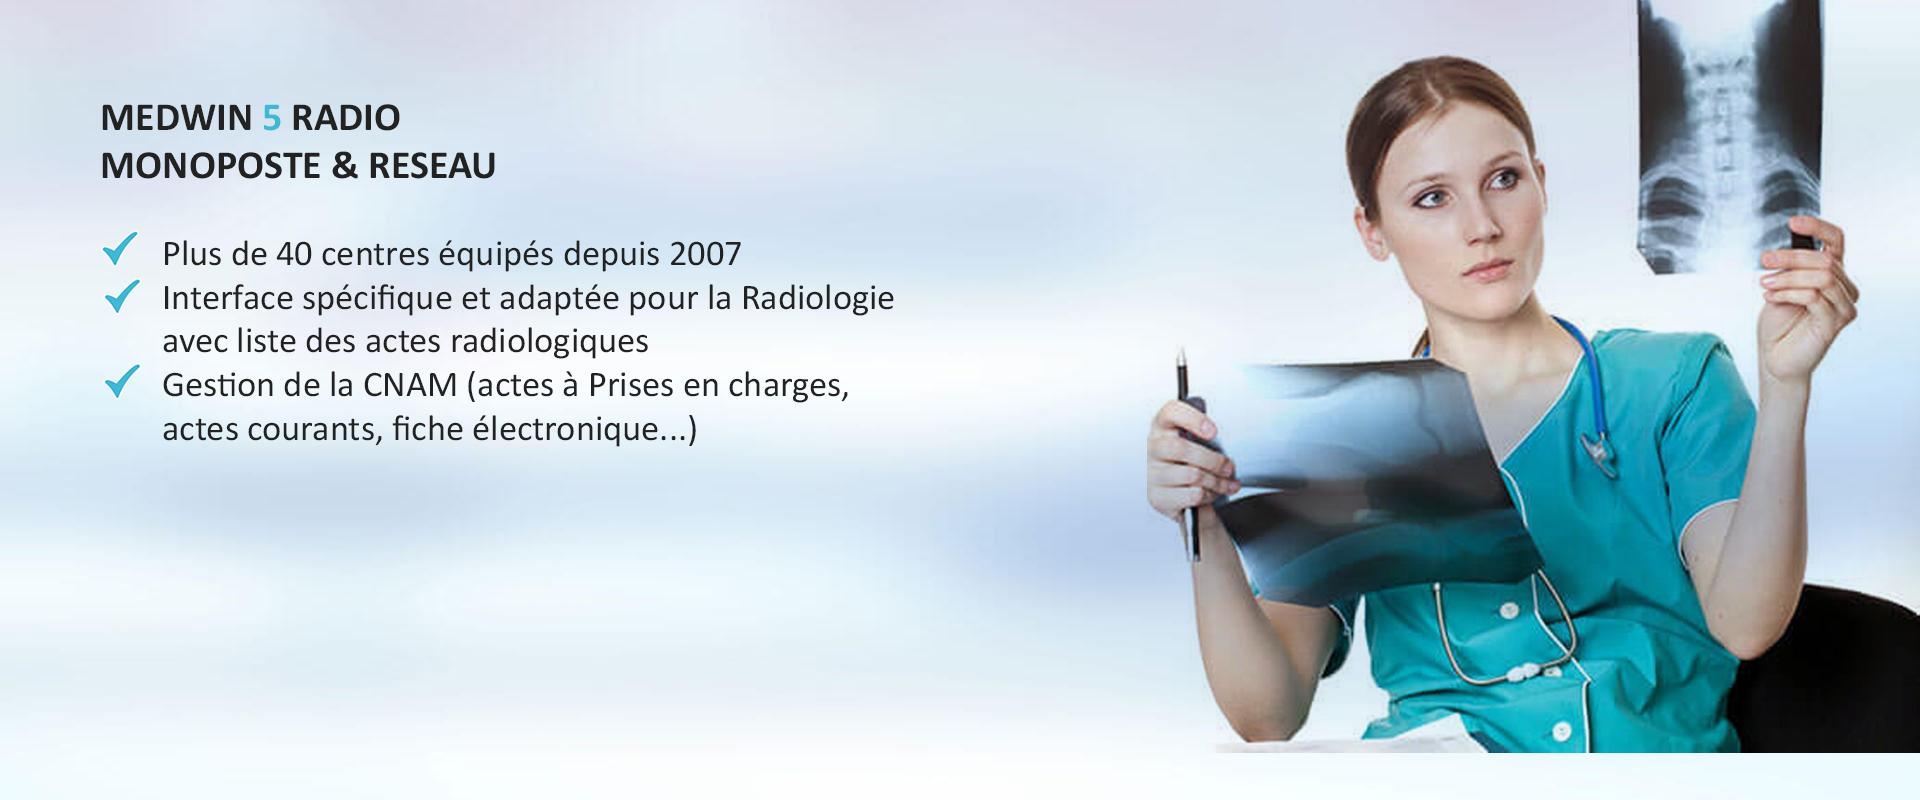 Medwin logiciel de gestion de cabinet medical numero 1 - Logiciel de gestion de cabinet medical ...